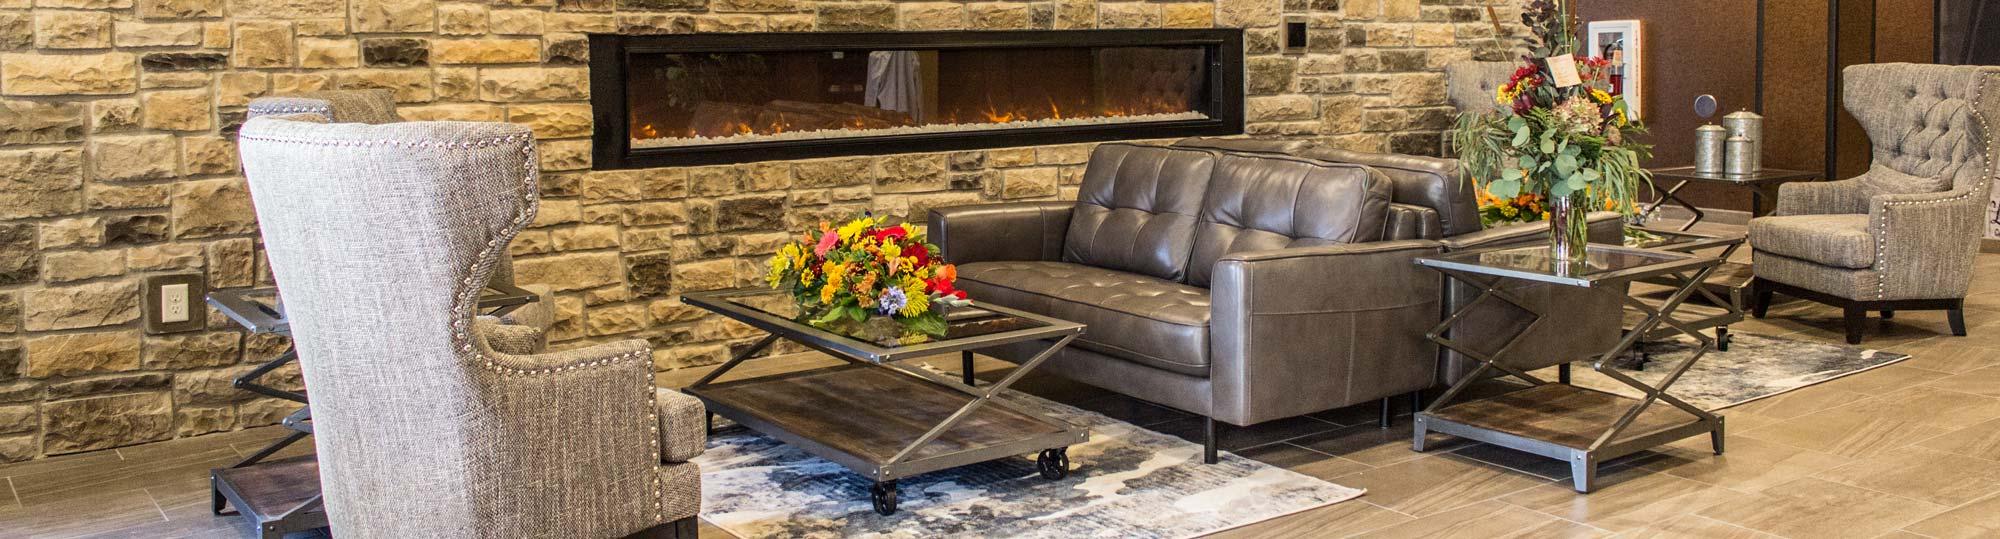 Cobblestone Hotel and Suites Chippewa Falls